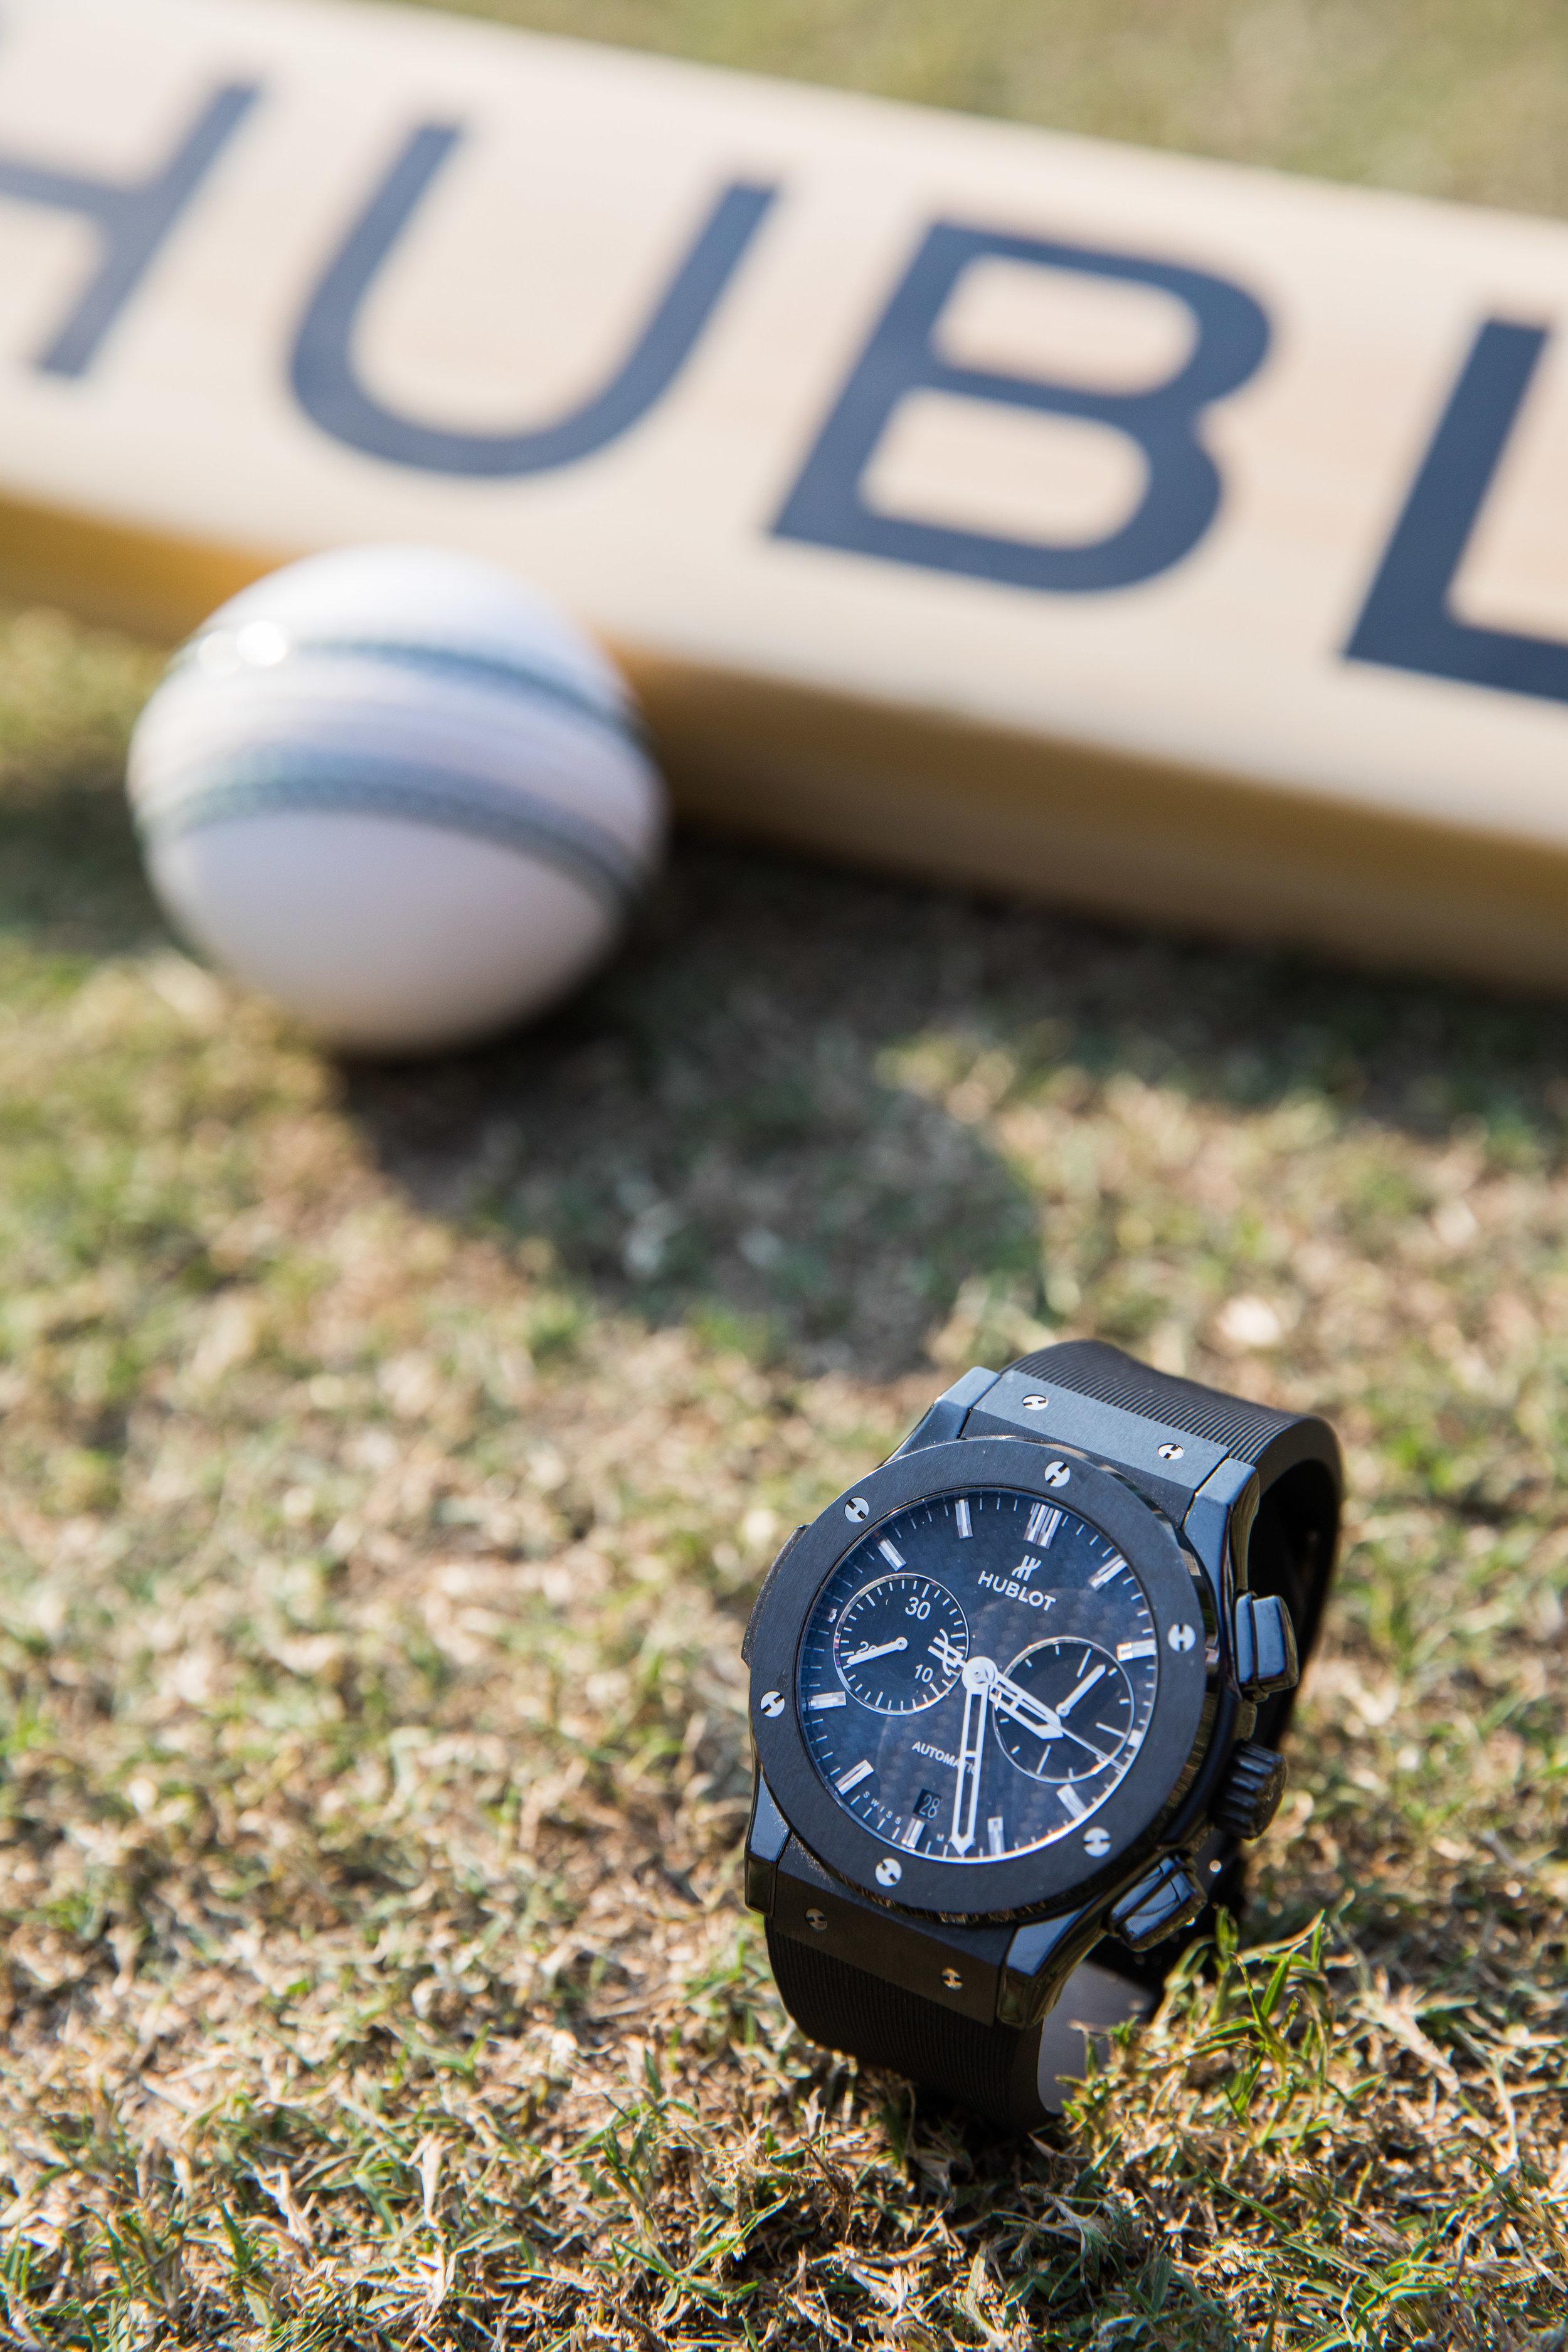 Hublot. Hong Kong Cricket Sixes